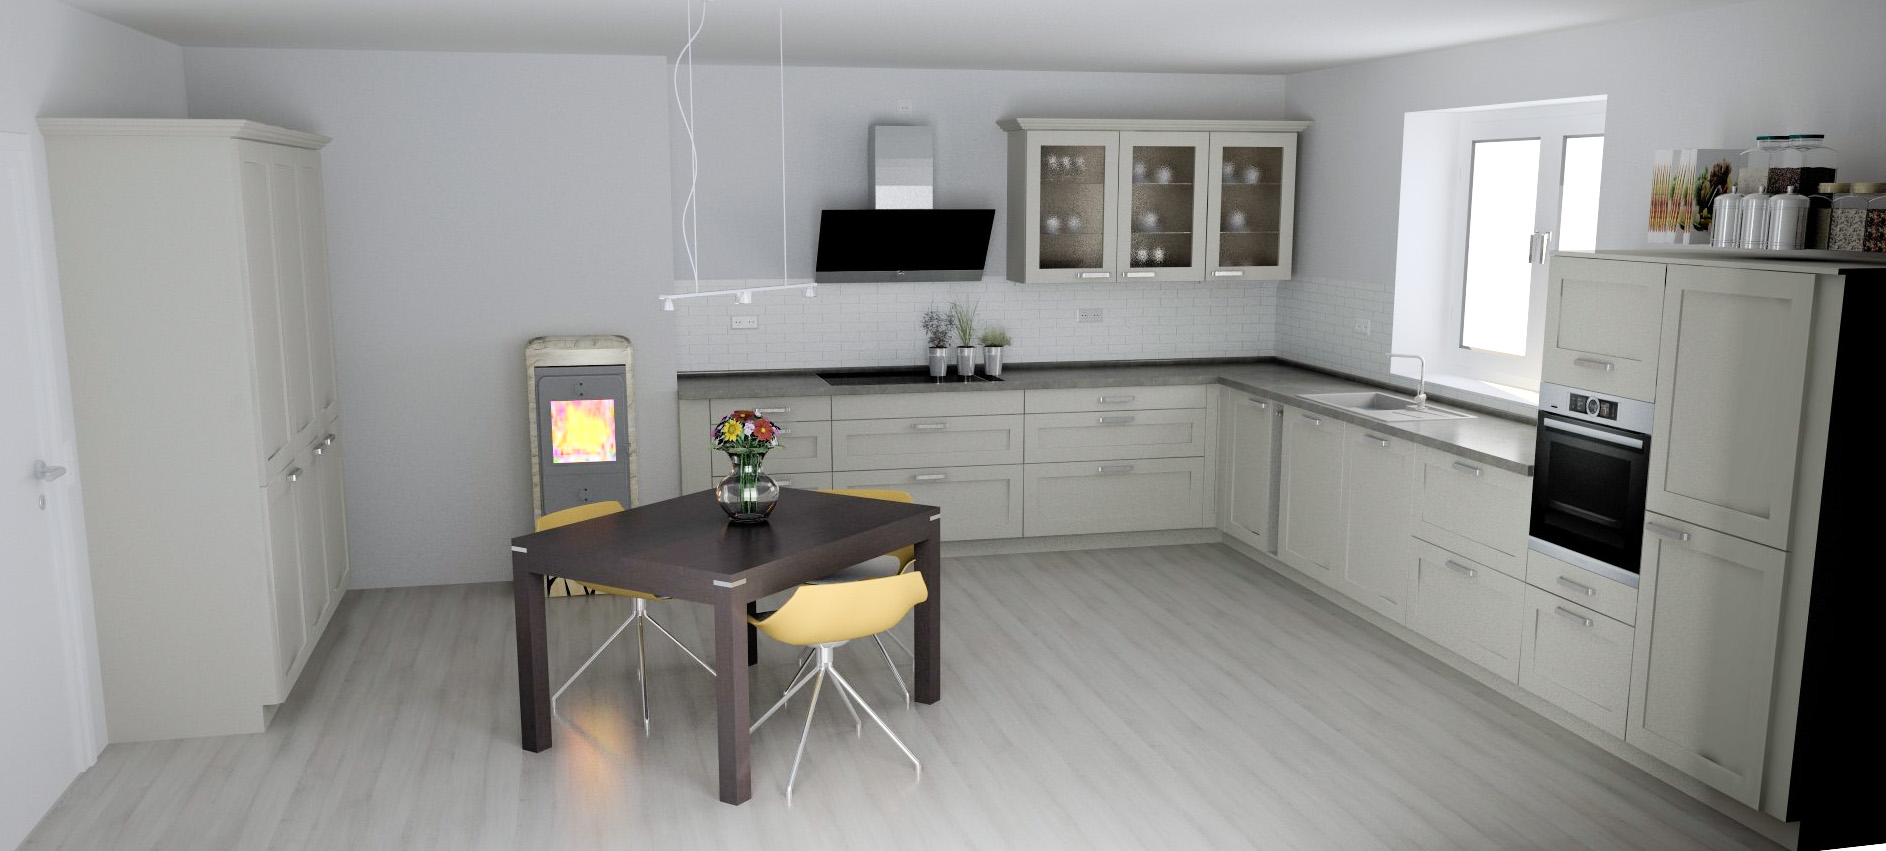 privat und objektk chen m llers k che. Black Bedroom Furniture Sets. Home Design Ideas